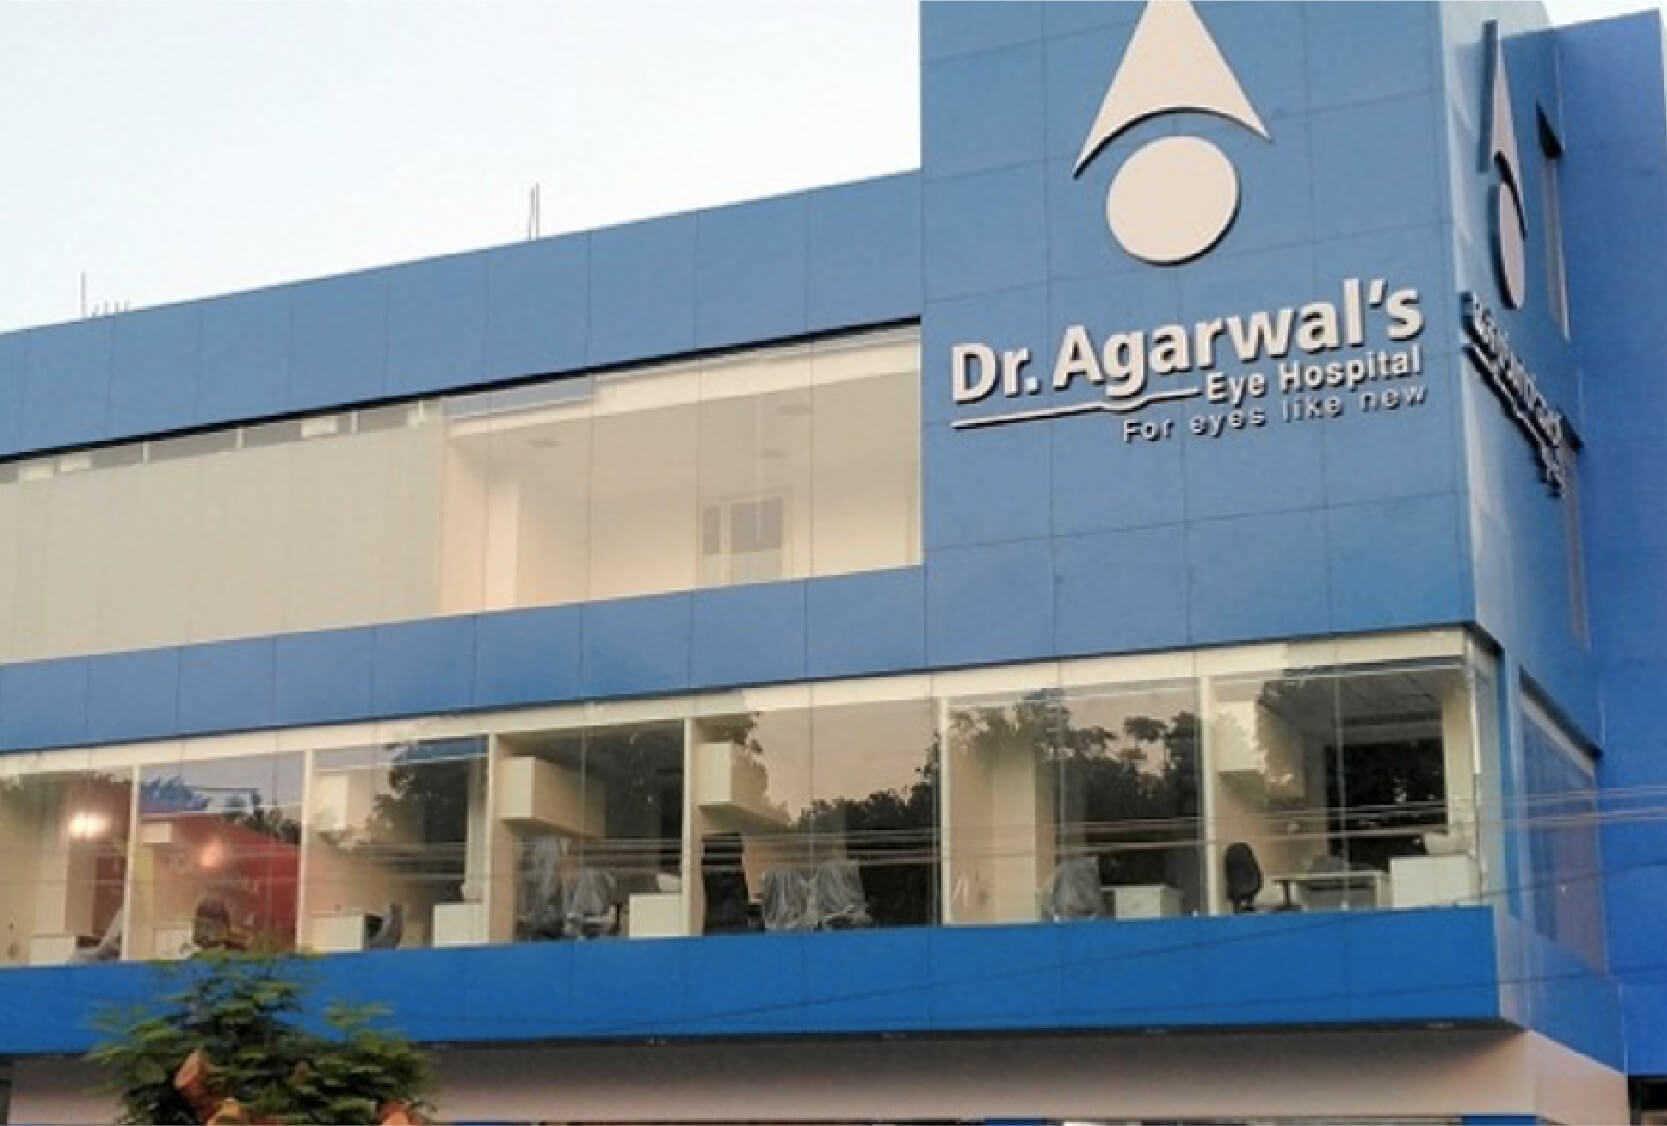 Dr agarwals